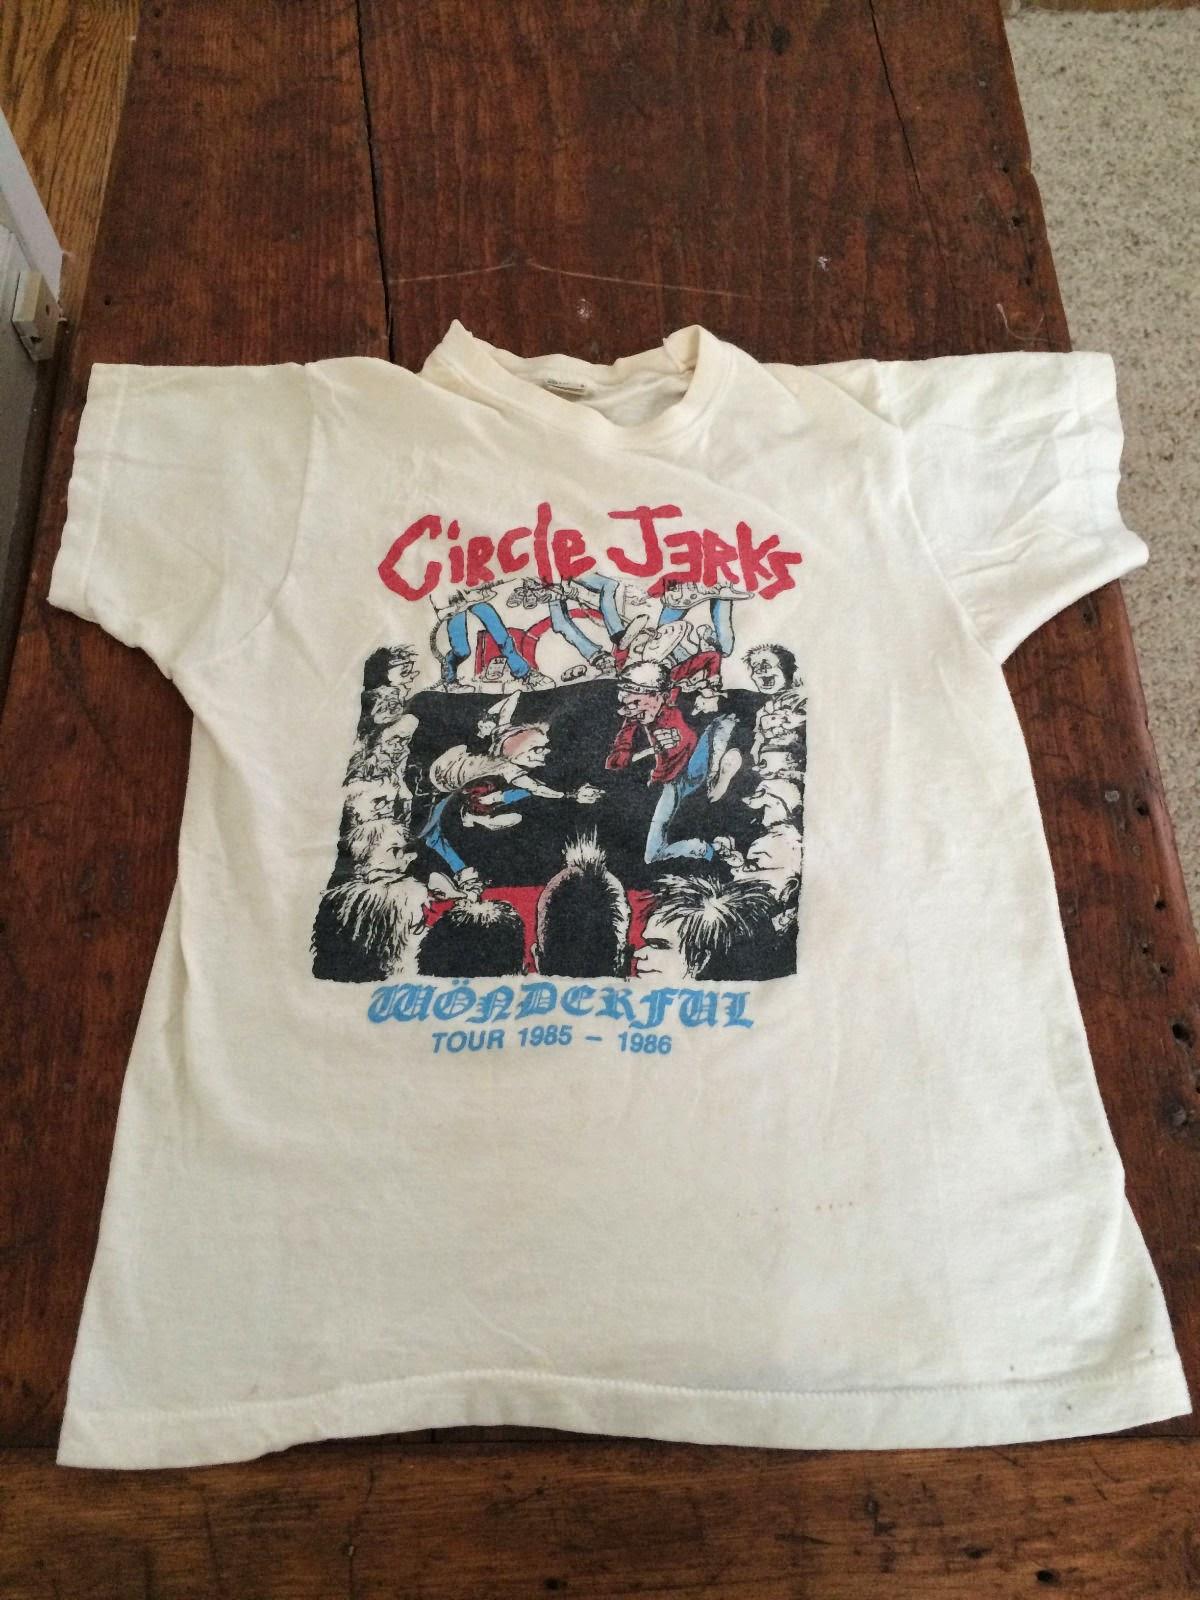 49be15350 Circle Jerks 1985 Vintage Wonderful Tour T-Shirt | vintage t-shirt